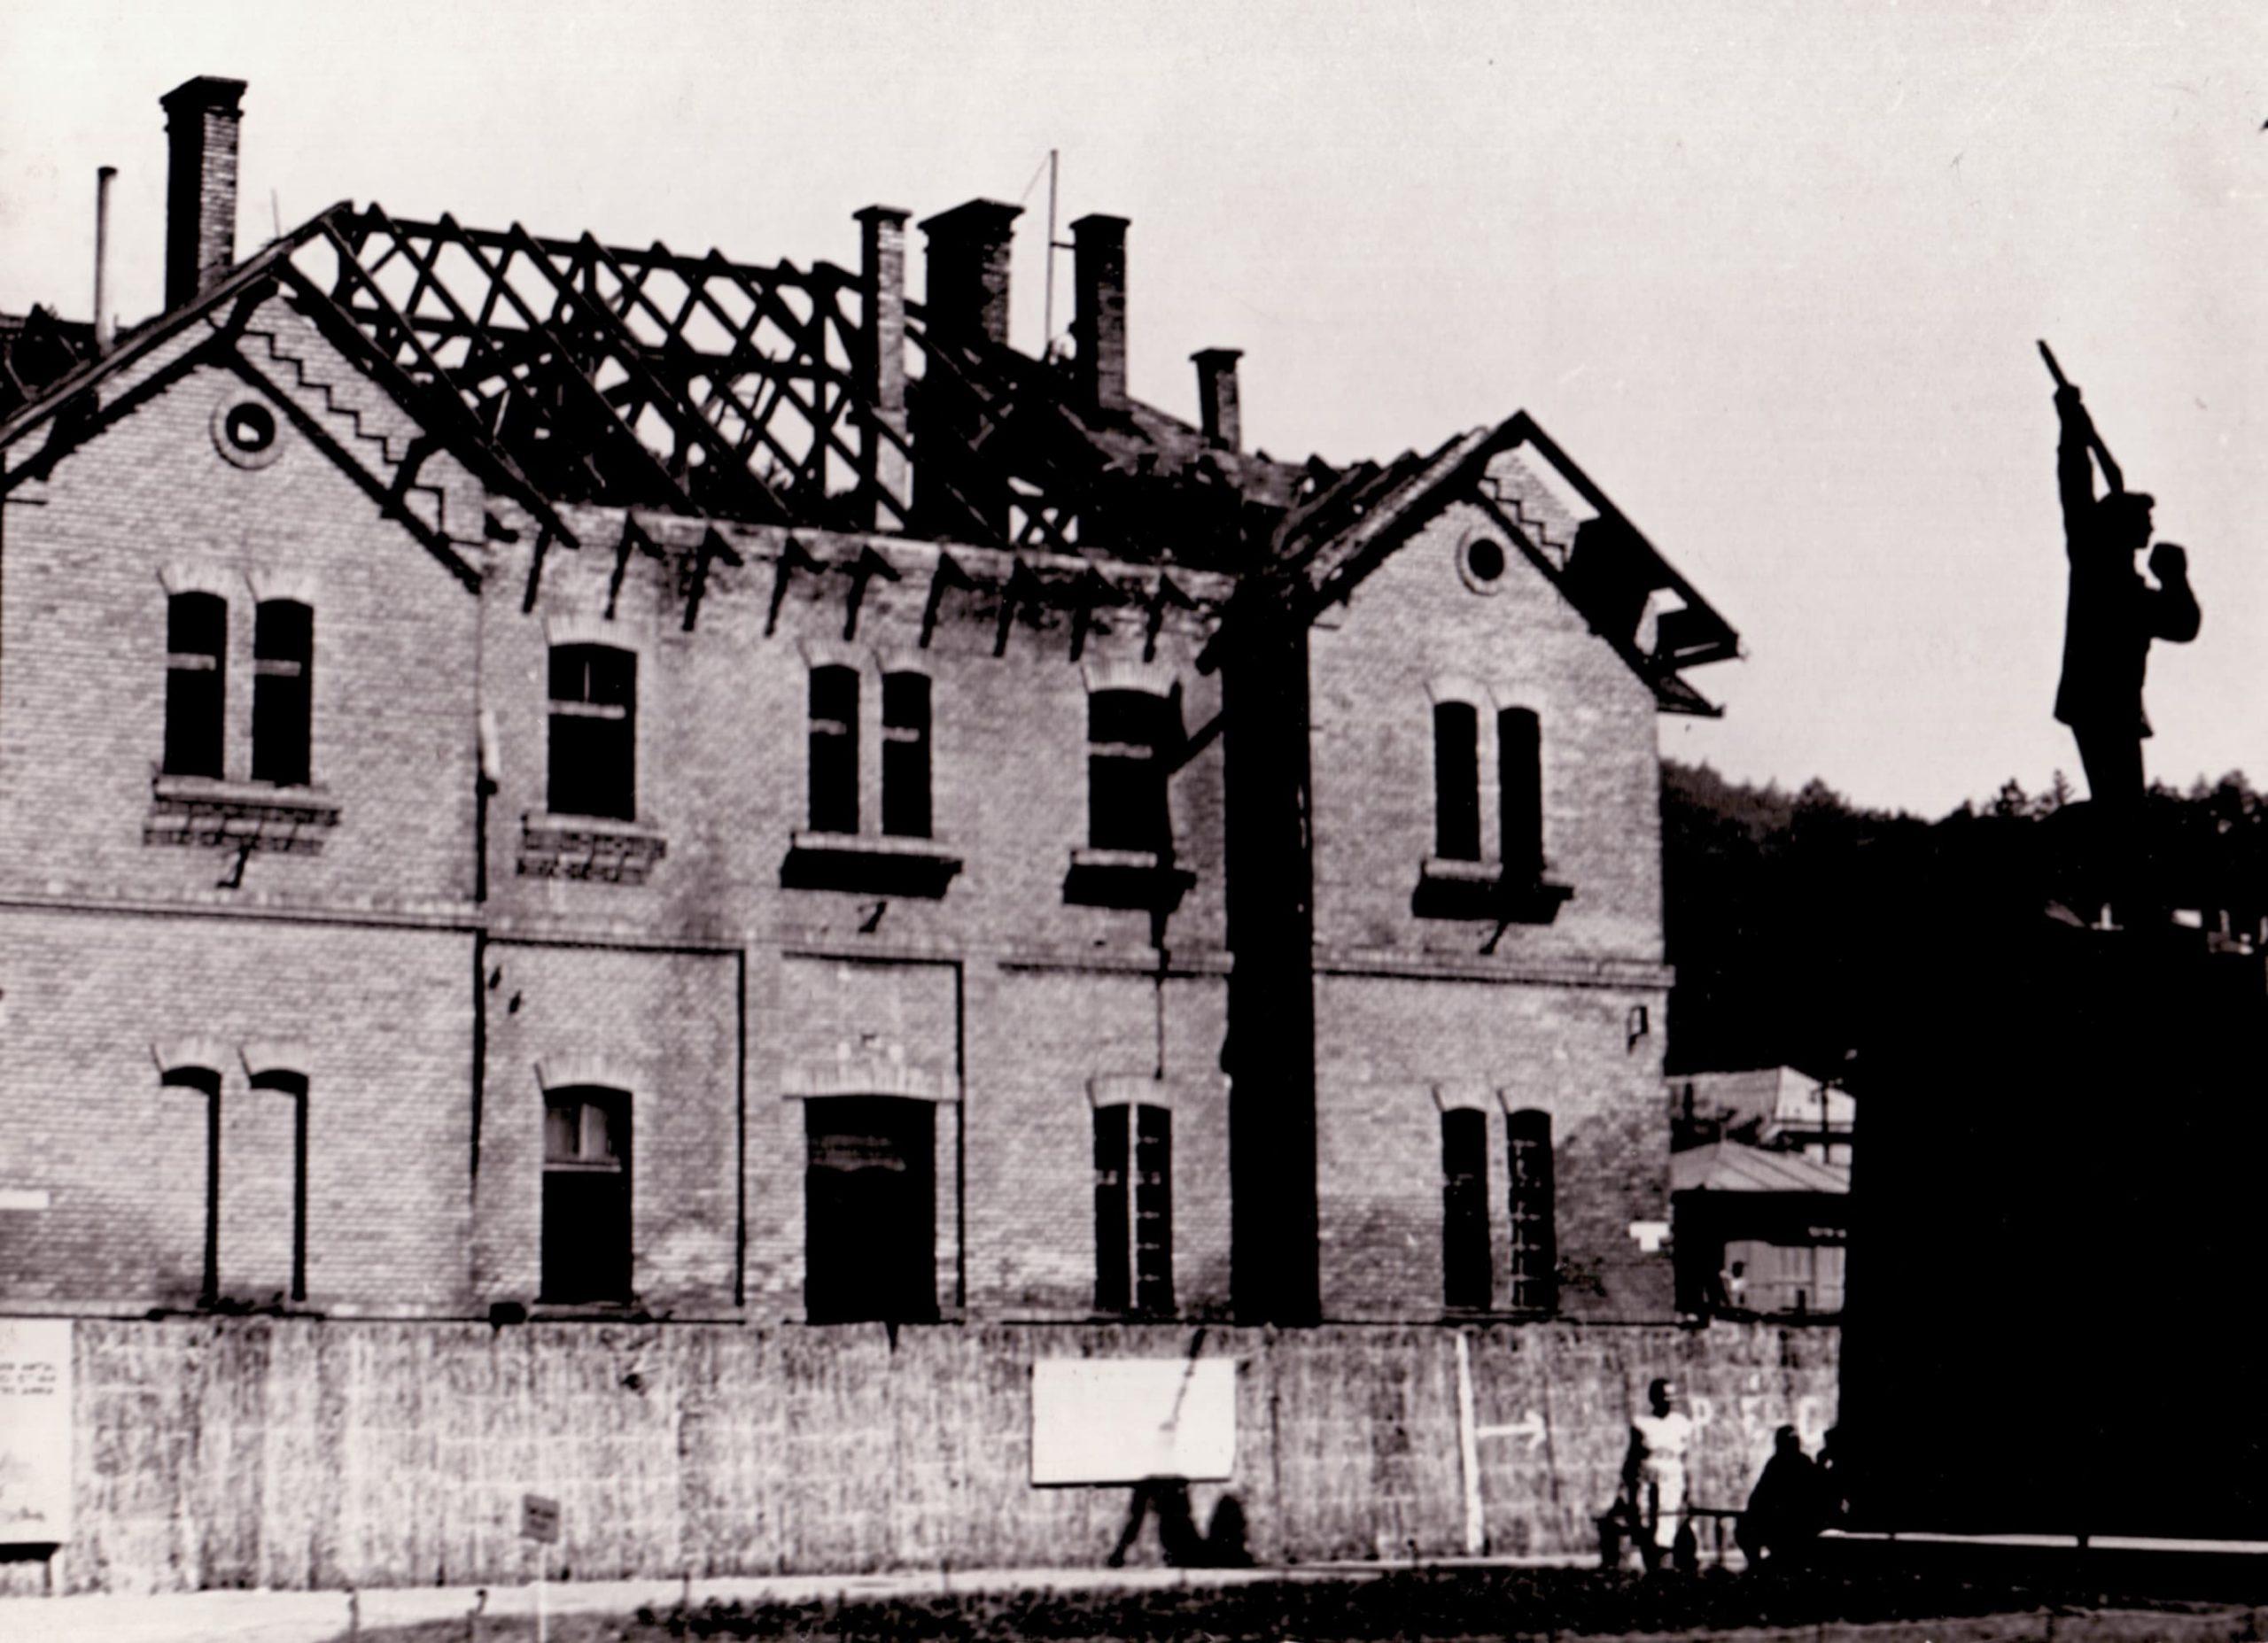 salgotarjani foteri vasutallomas epuletenk bontasa 1969